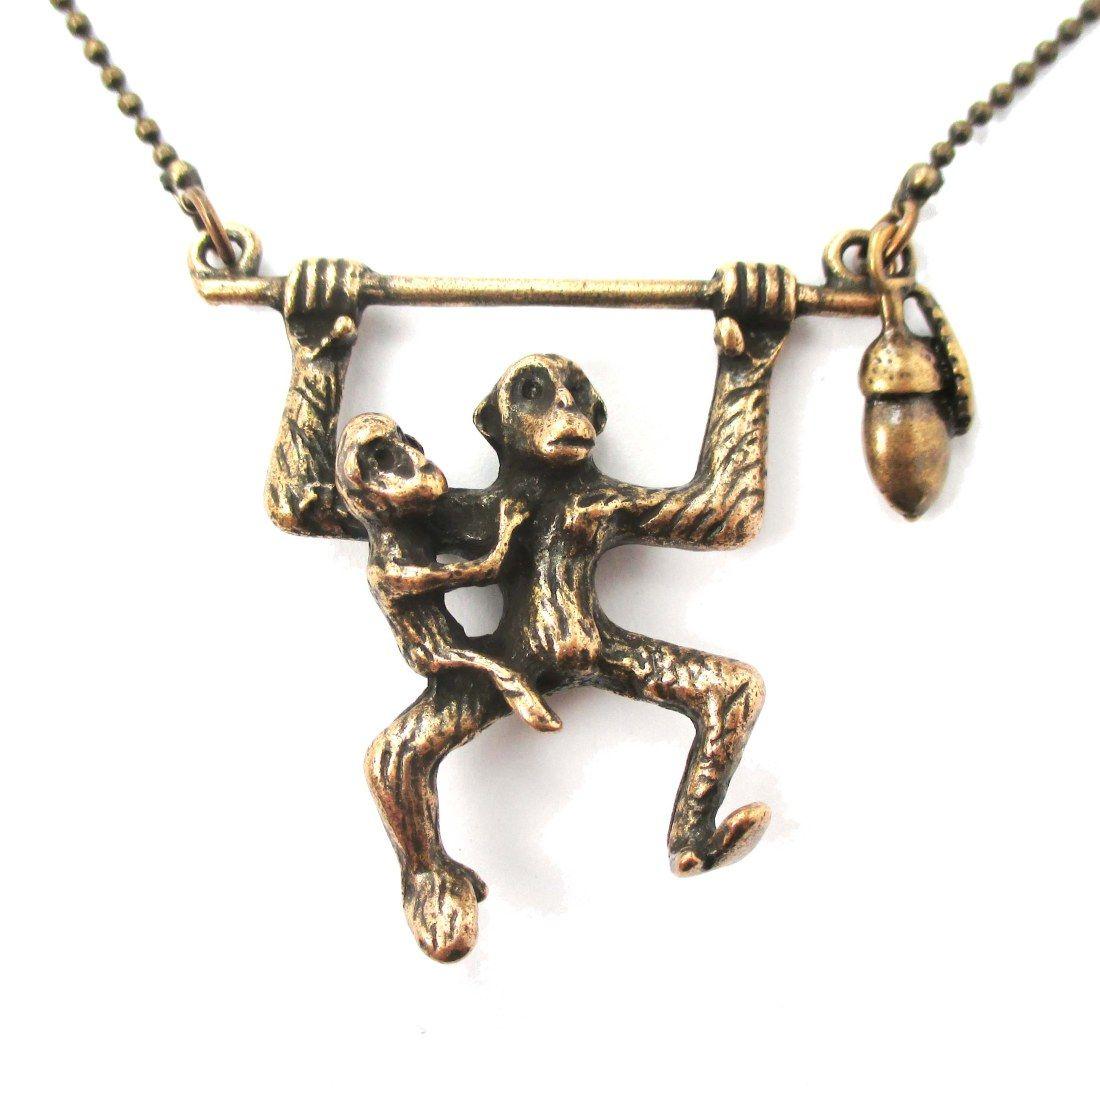 3d monkey mother and baby shaped animal pendant necklace in bronze 3d monkey mother and baby shaped animal pendant necklace in bronze 1150 monkeys animals aloadofball Choice Image